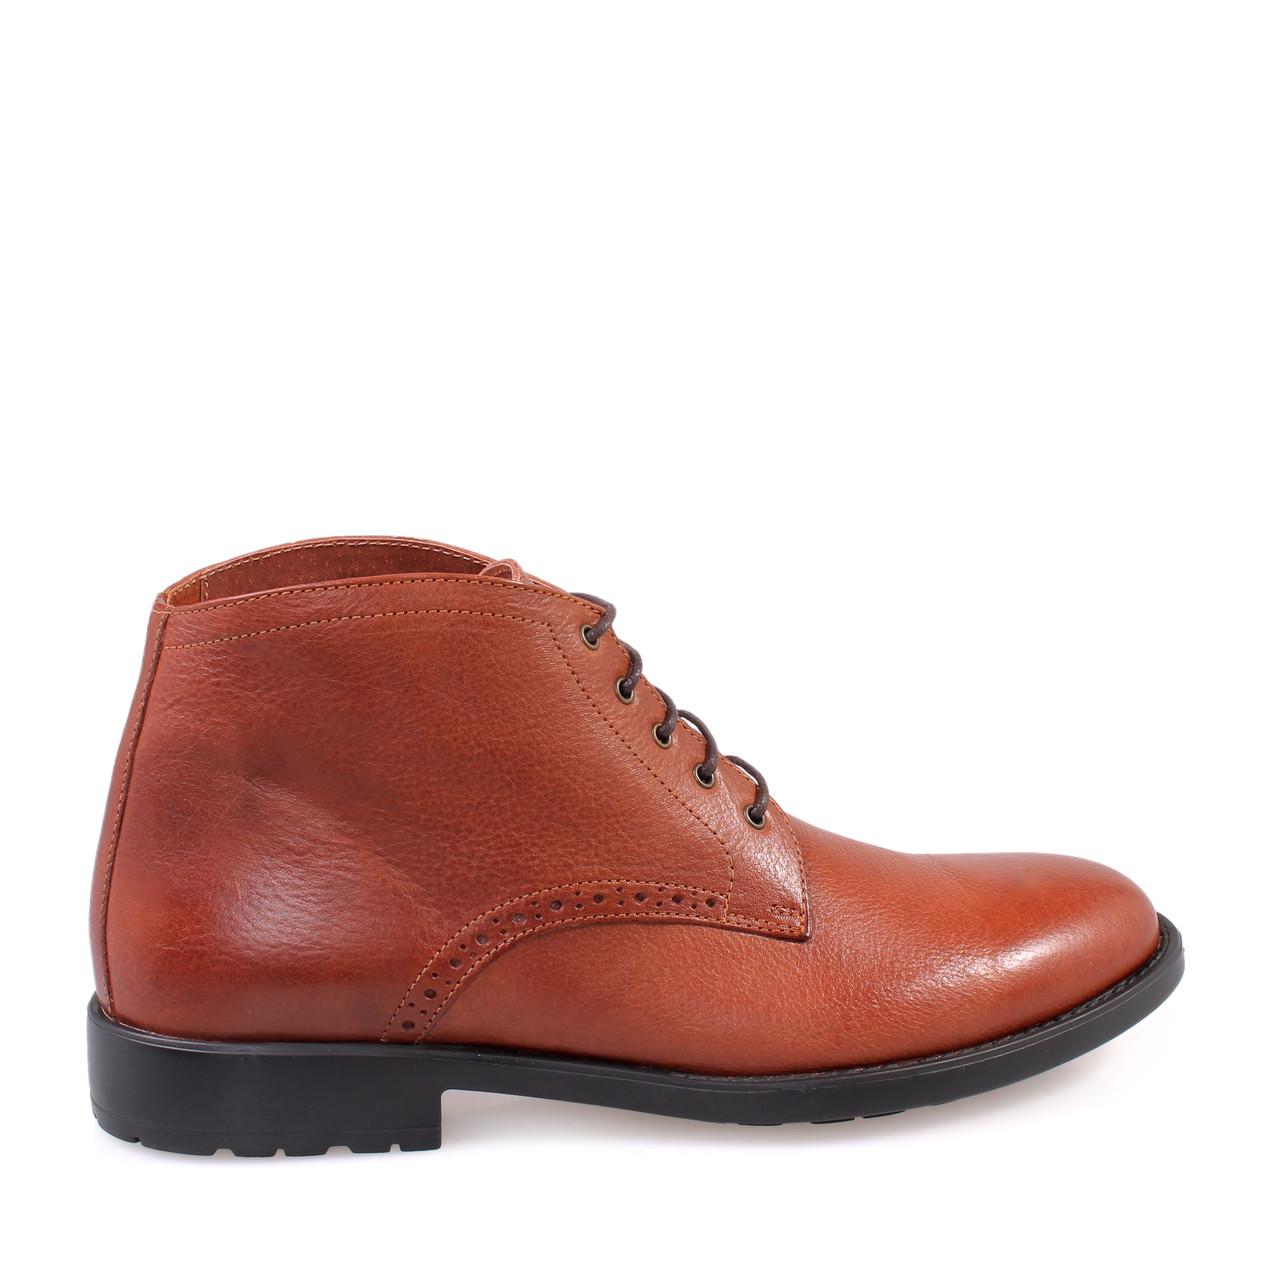 97f9784e3dd Best Offers > Ενήλικες > Παπούτσια > Μπότες & Μποτάκια / ΓΥΝΑΙΚΕΙΑ ...